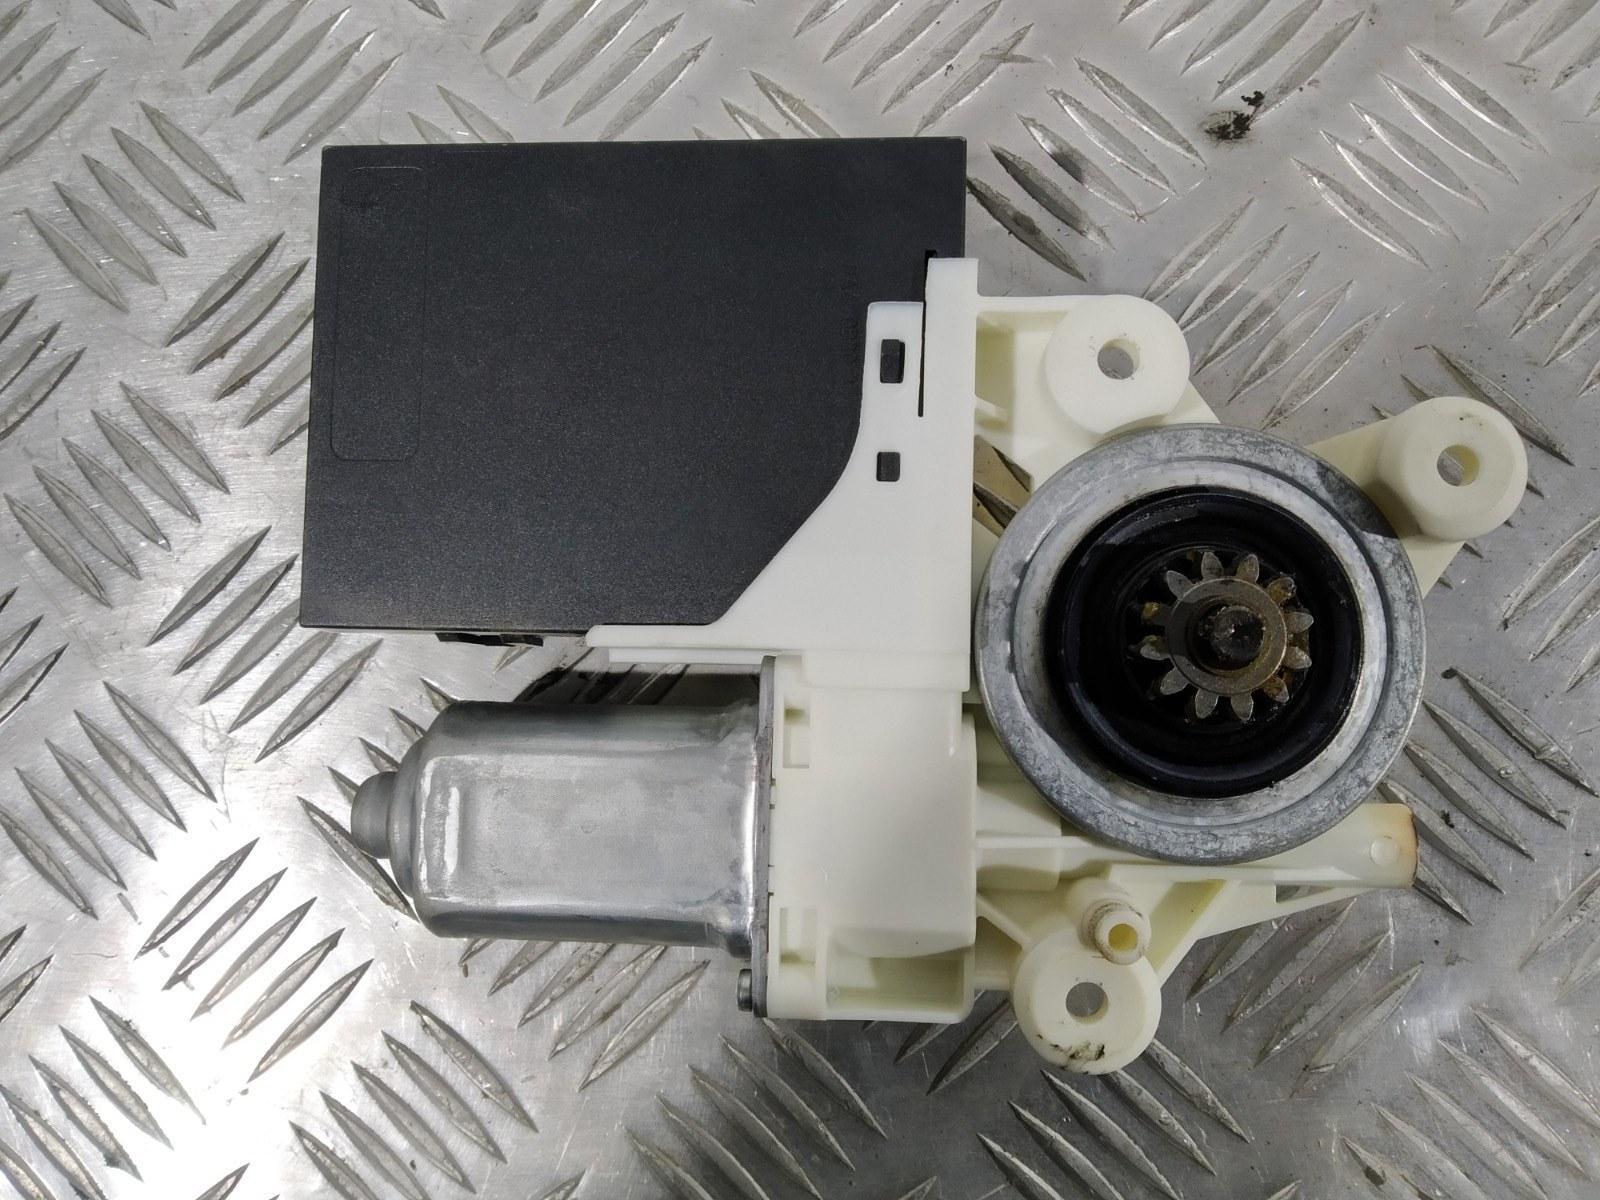 Моторчик стеклоподъемника передний левый Ford C-Max 2.0 I 2006 (б/у)